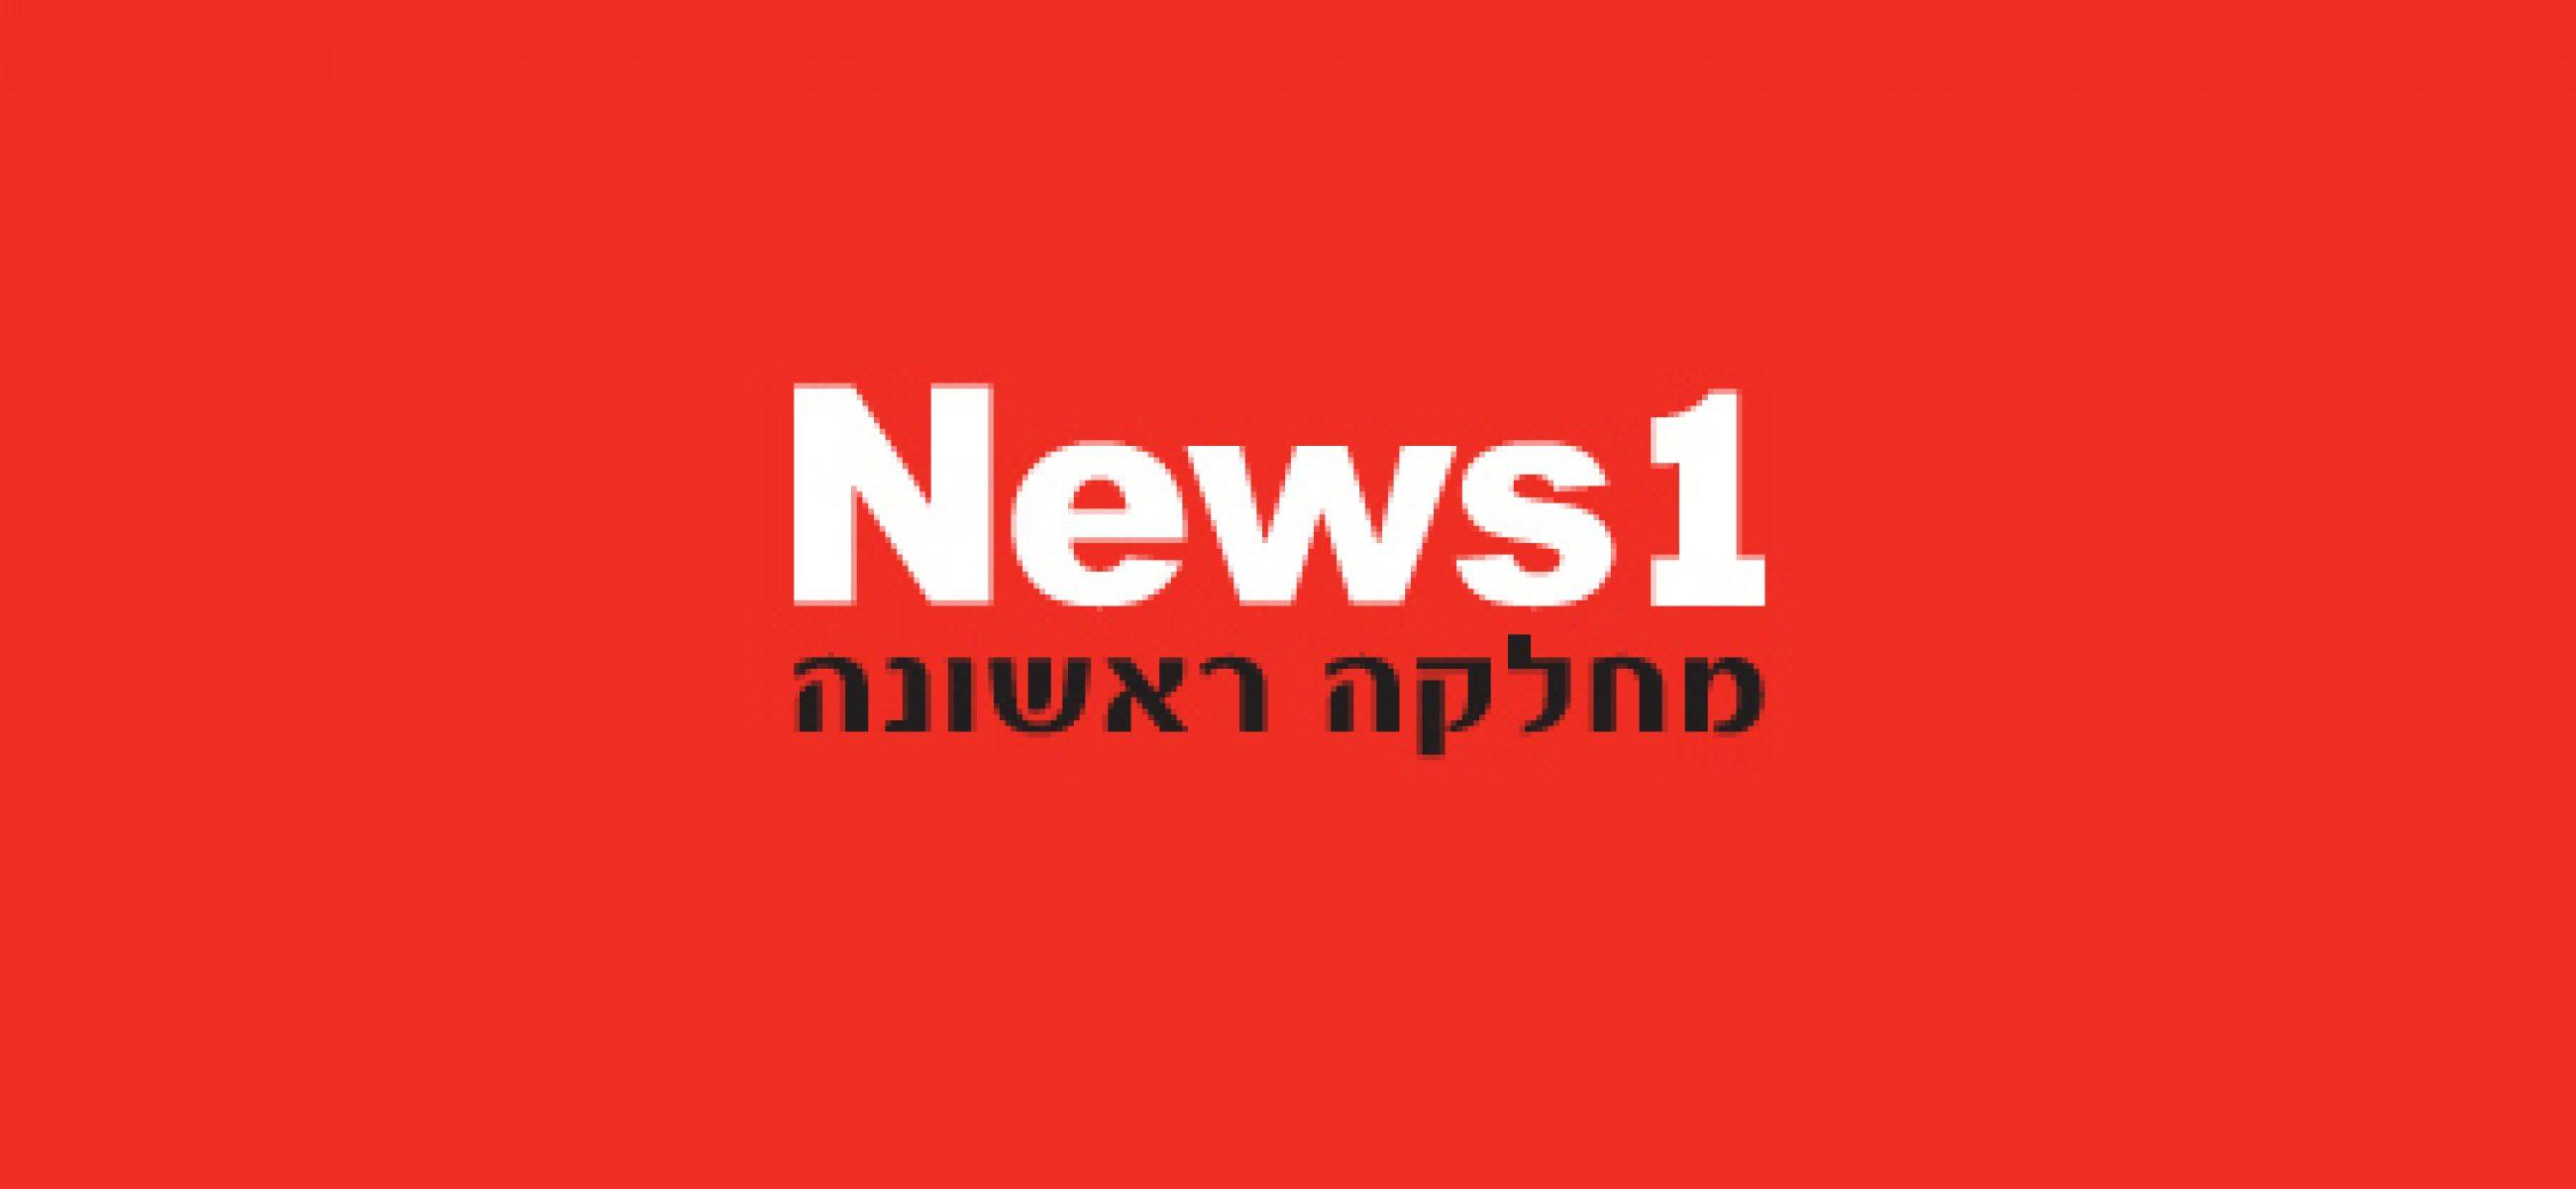 "News1 על הספר: "" מיסוי בינלאומי – הדין בישראל"""